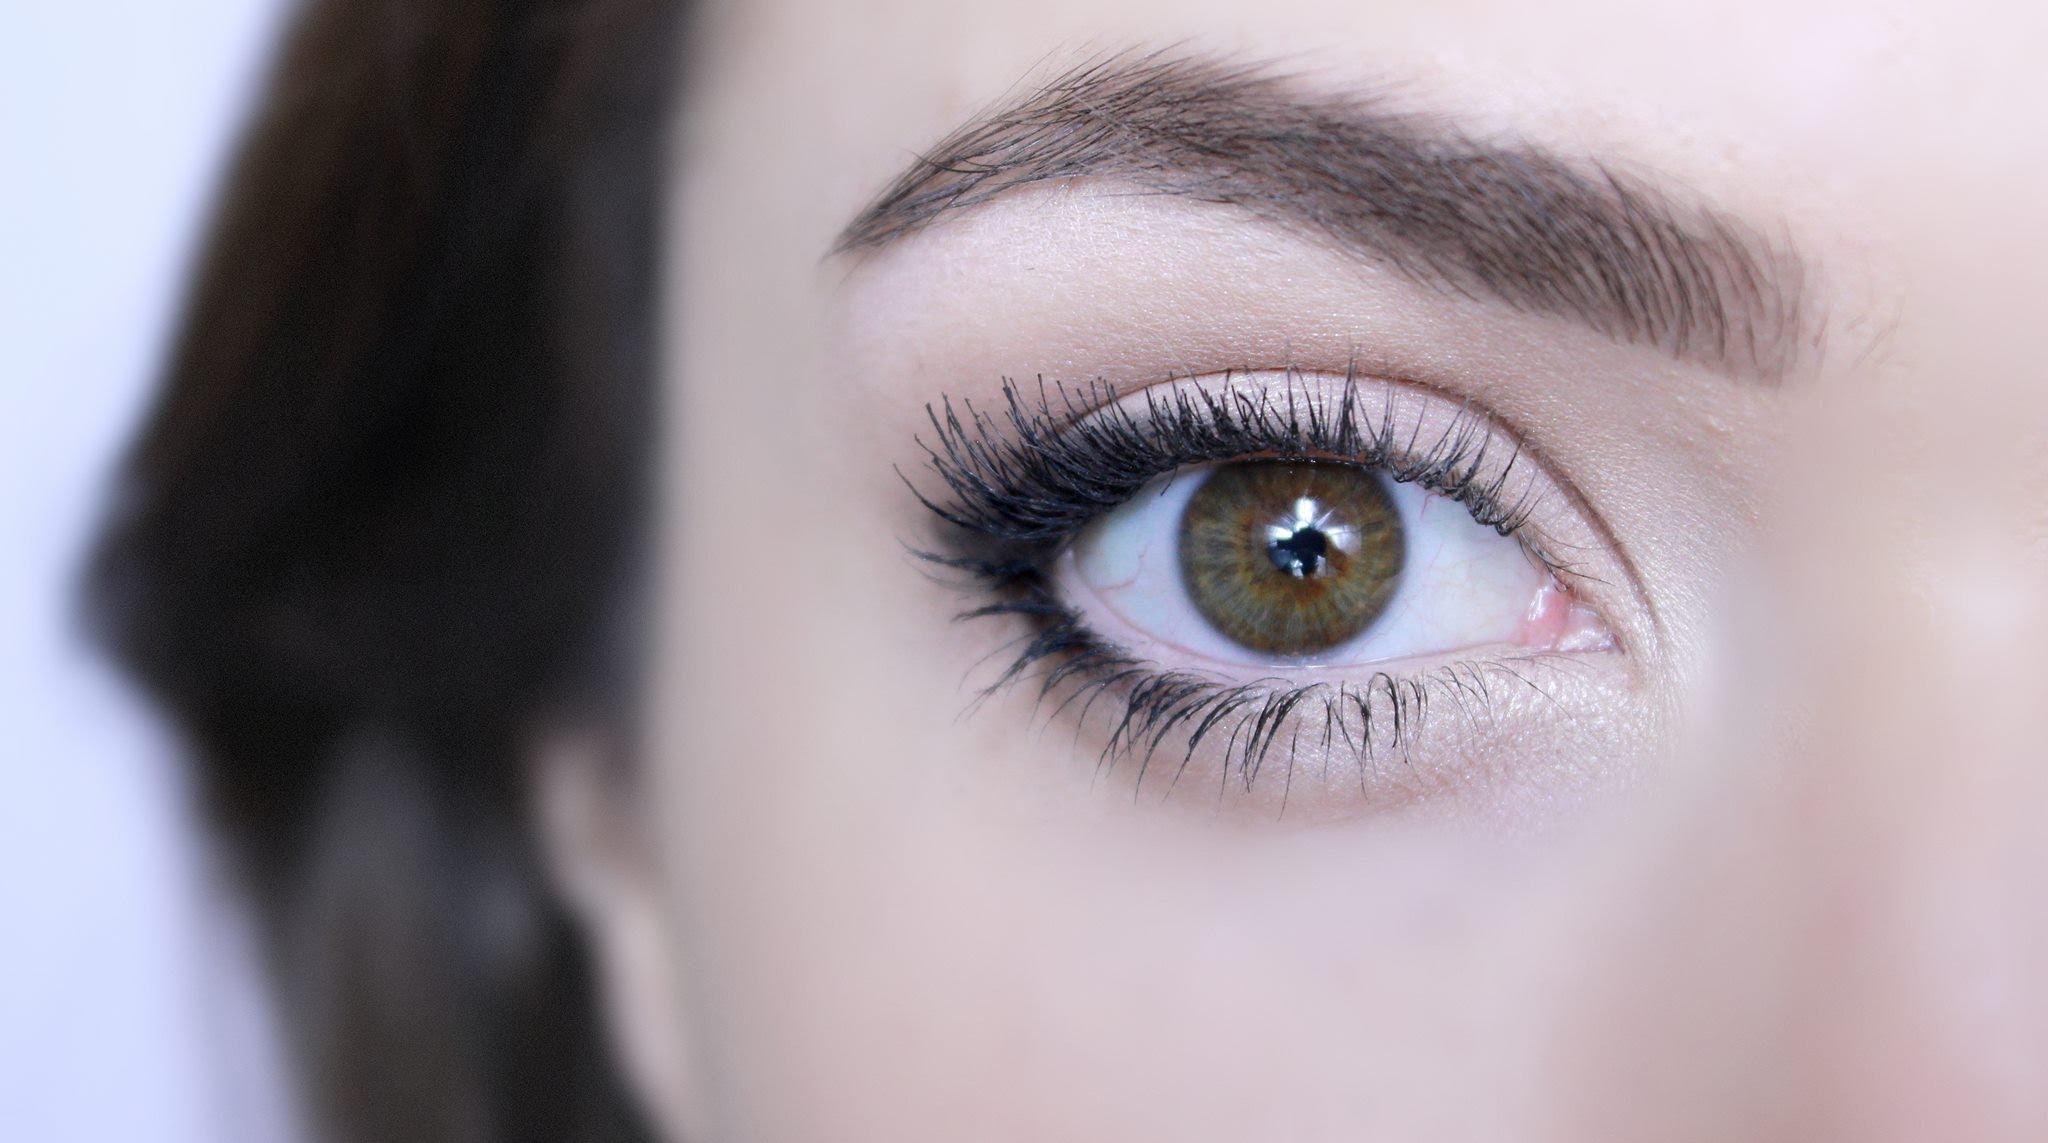 Drawn eyeball big eye Your Make To YouTube Look